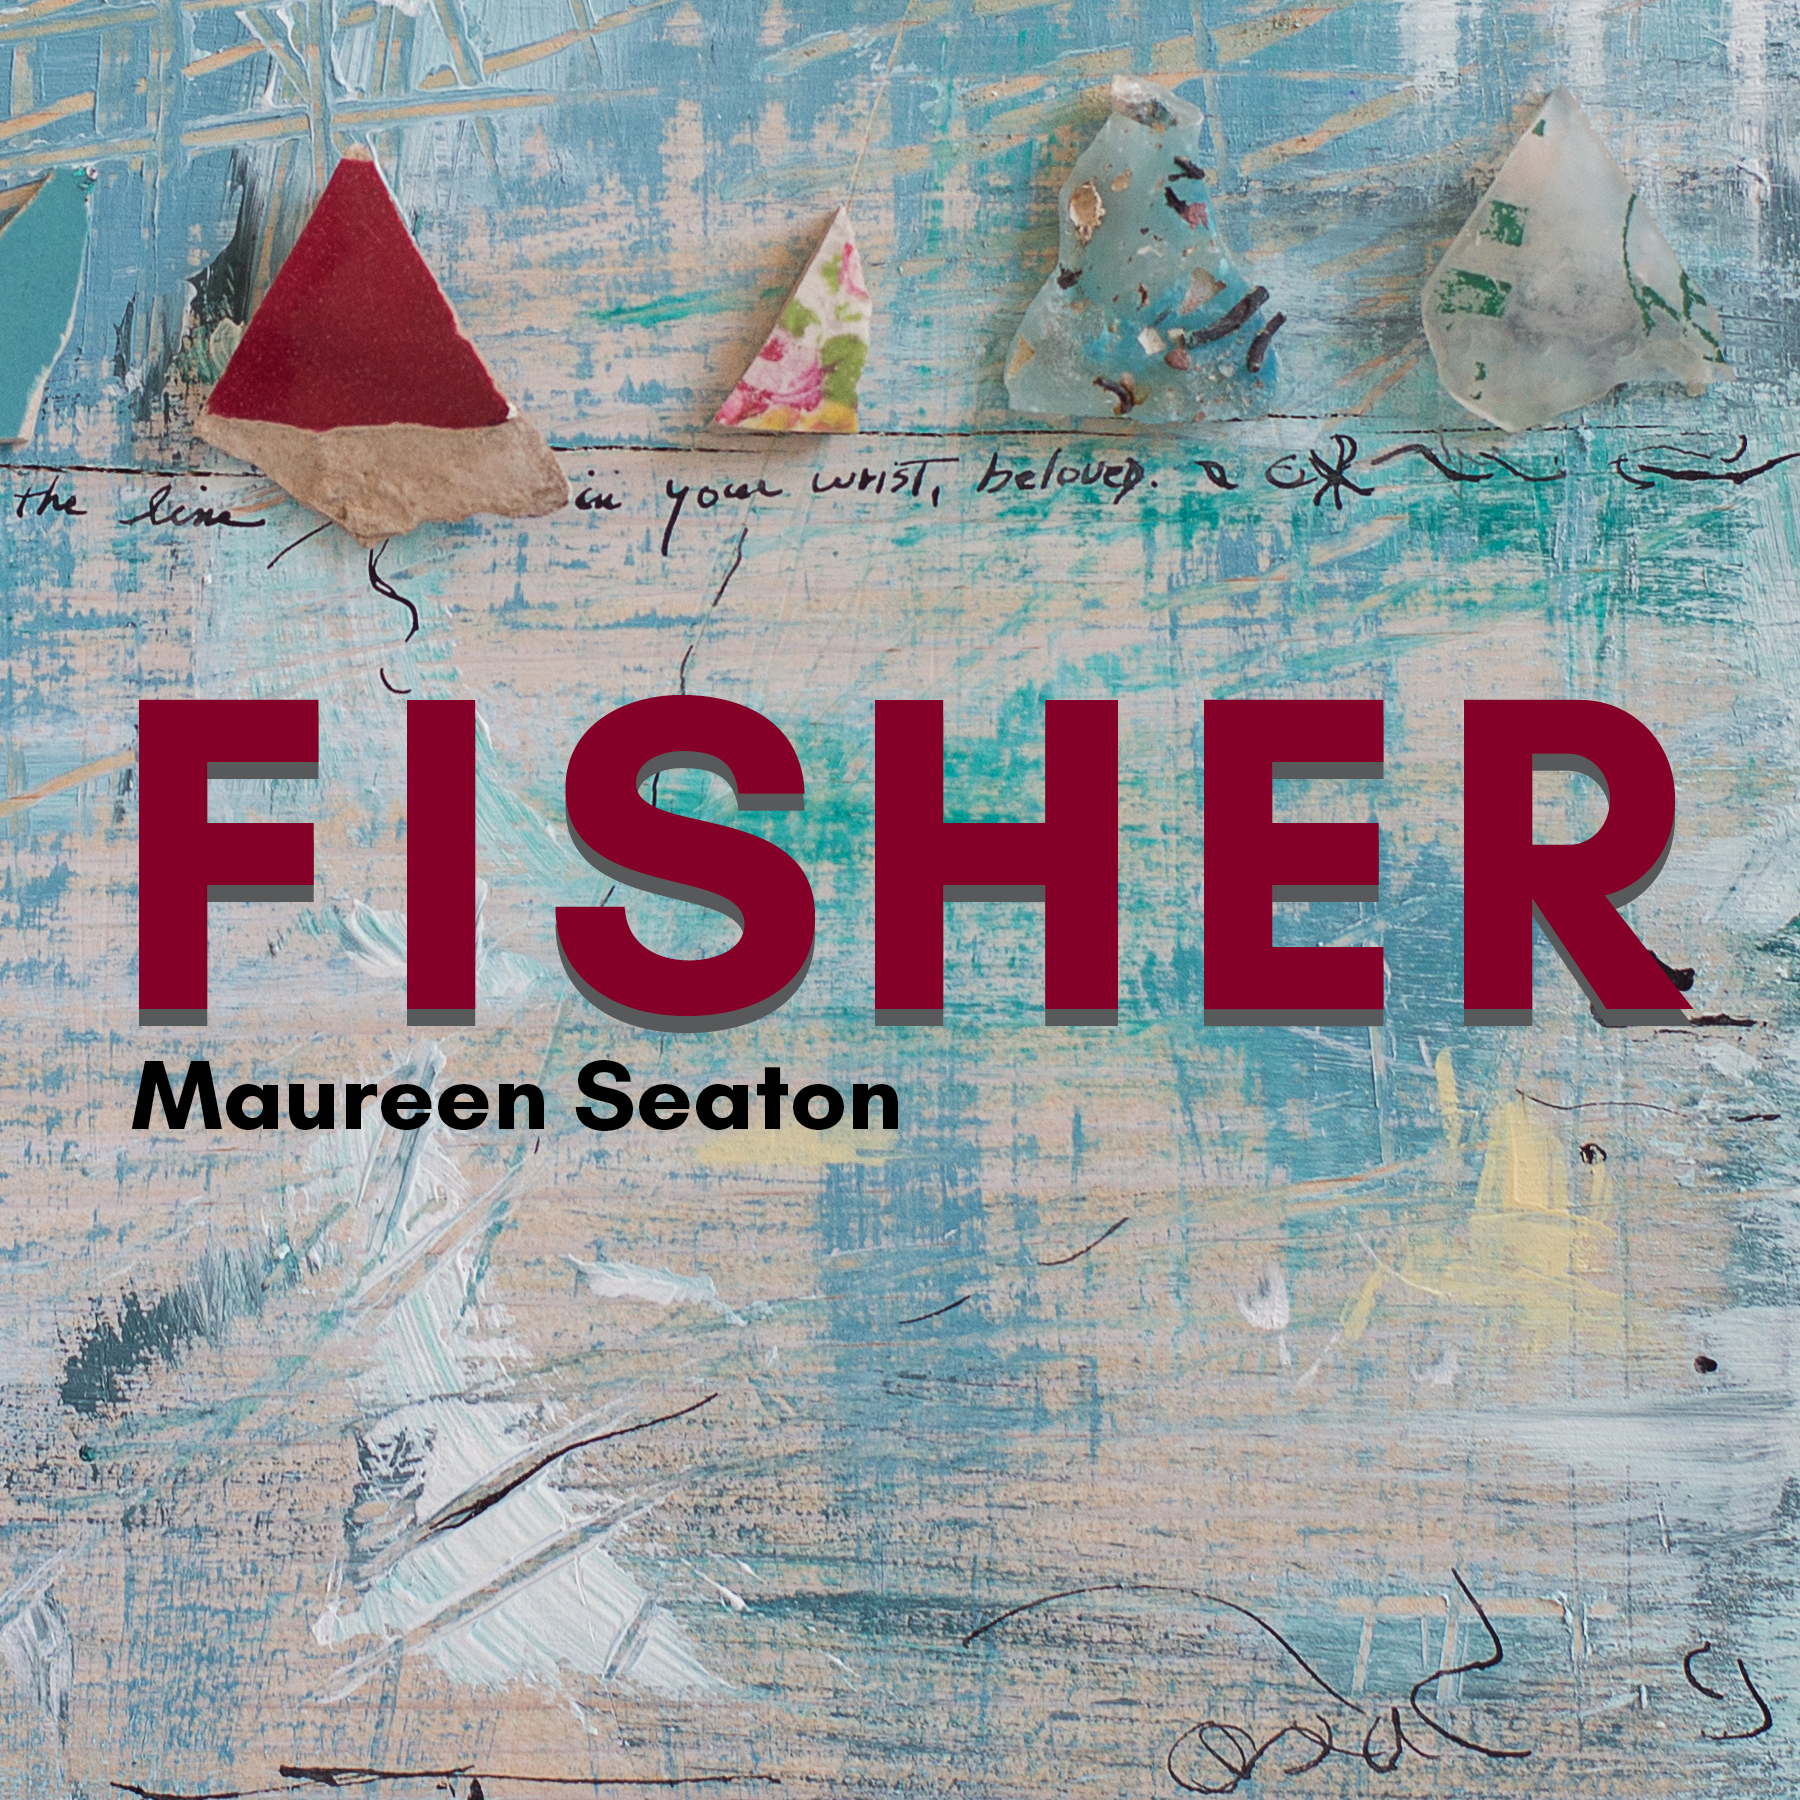 Fisher by Maureen Seaton